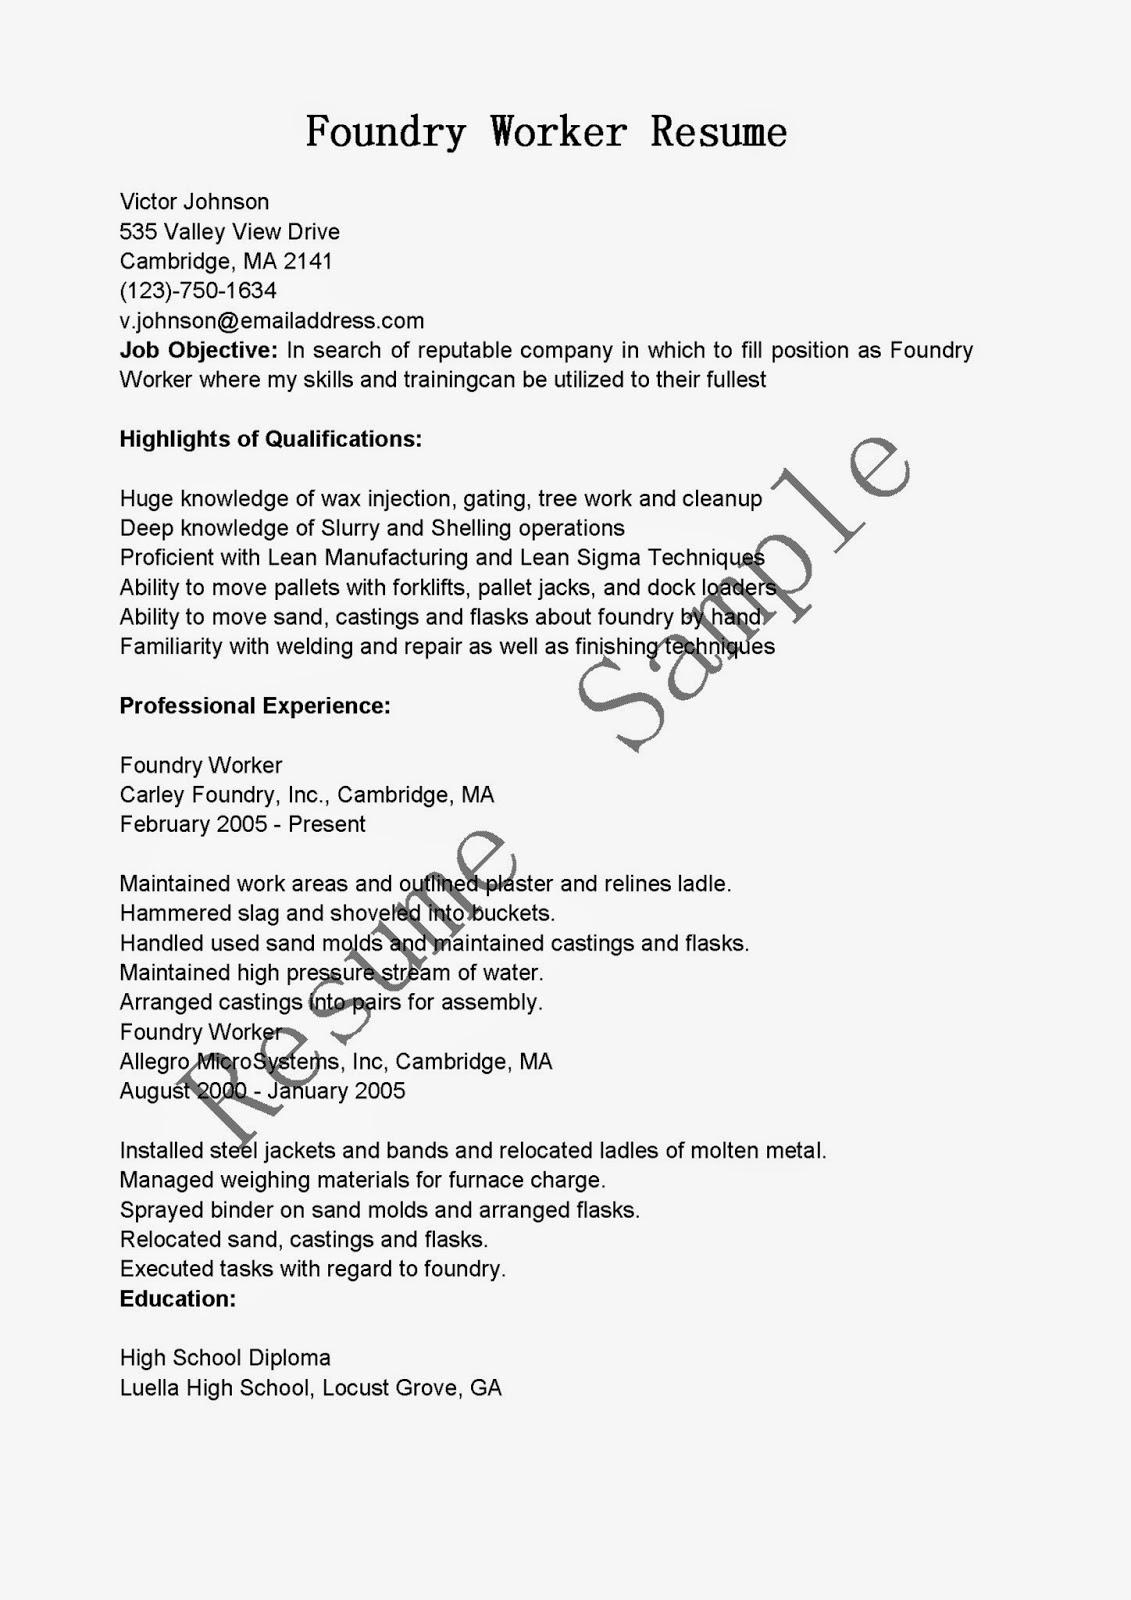 foundry resume example